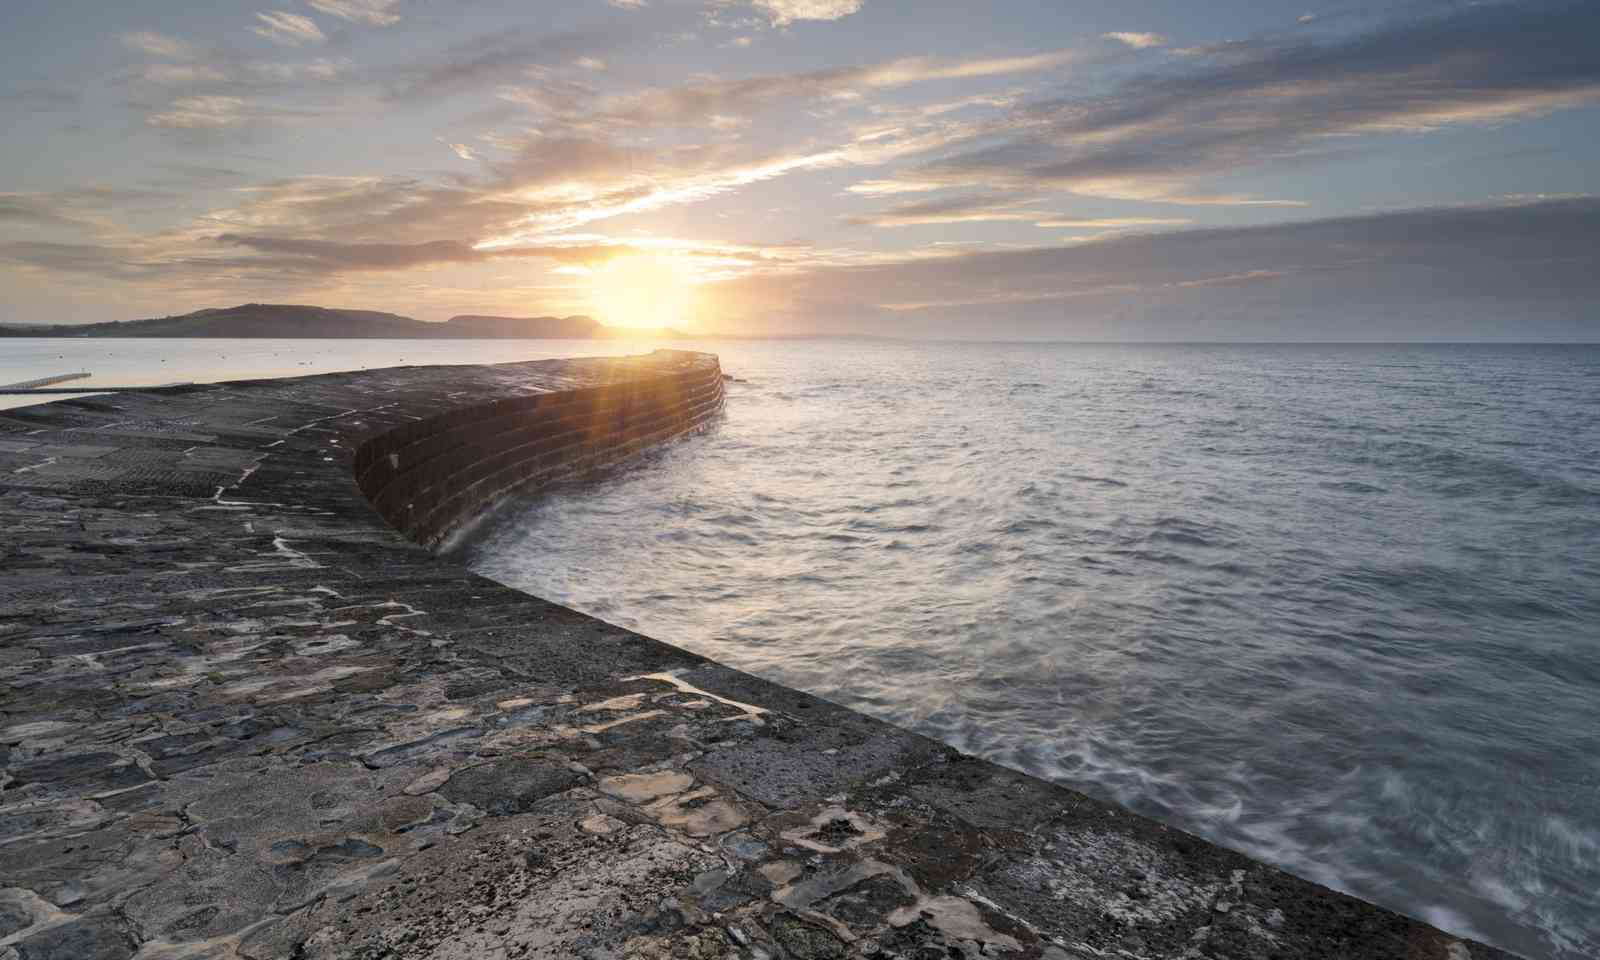 The Cobb at Lyme Regis (Dreamstime)